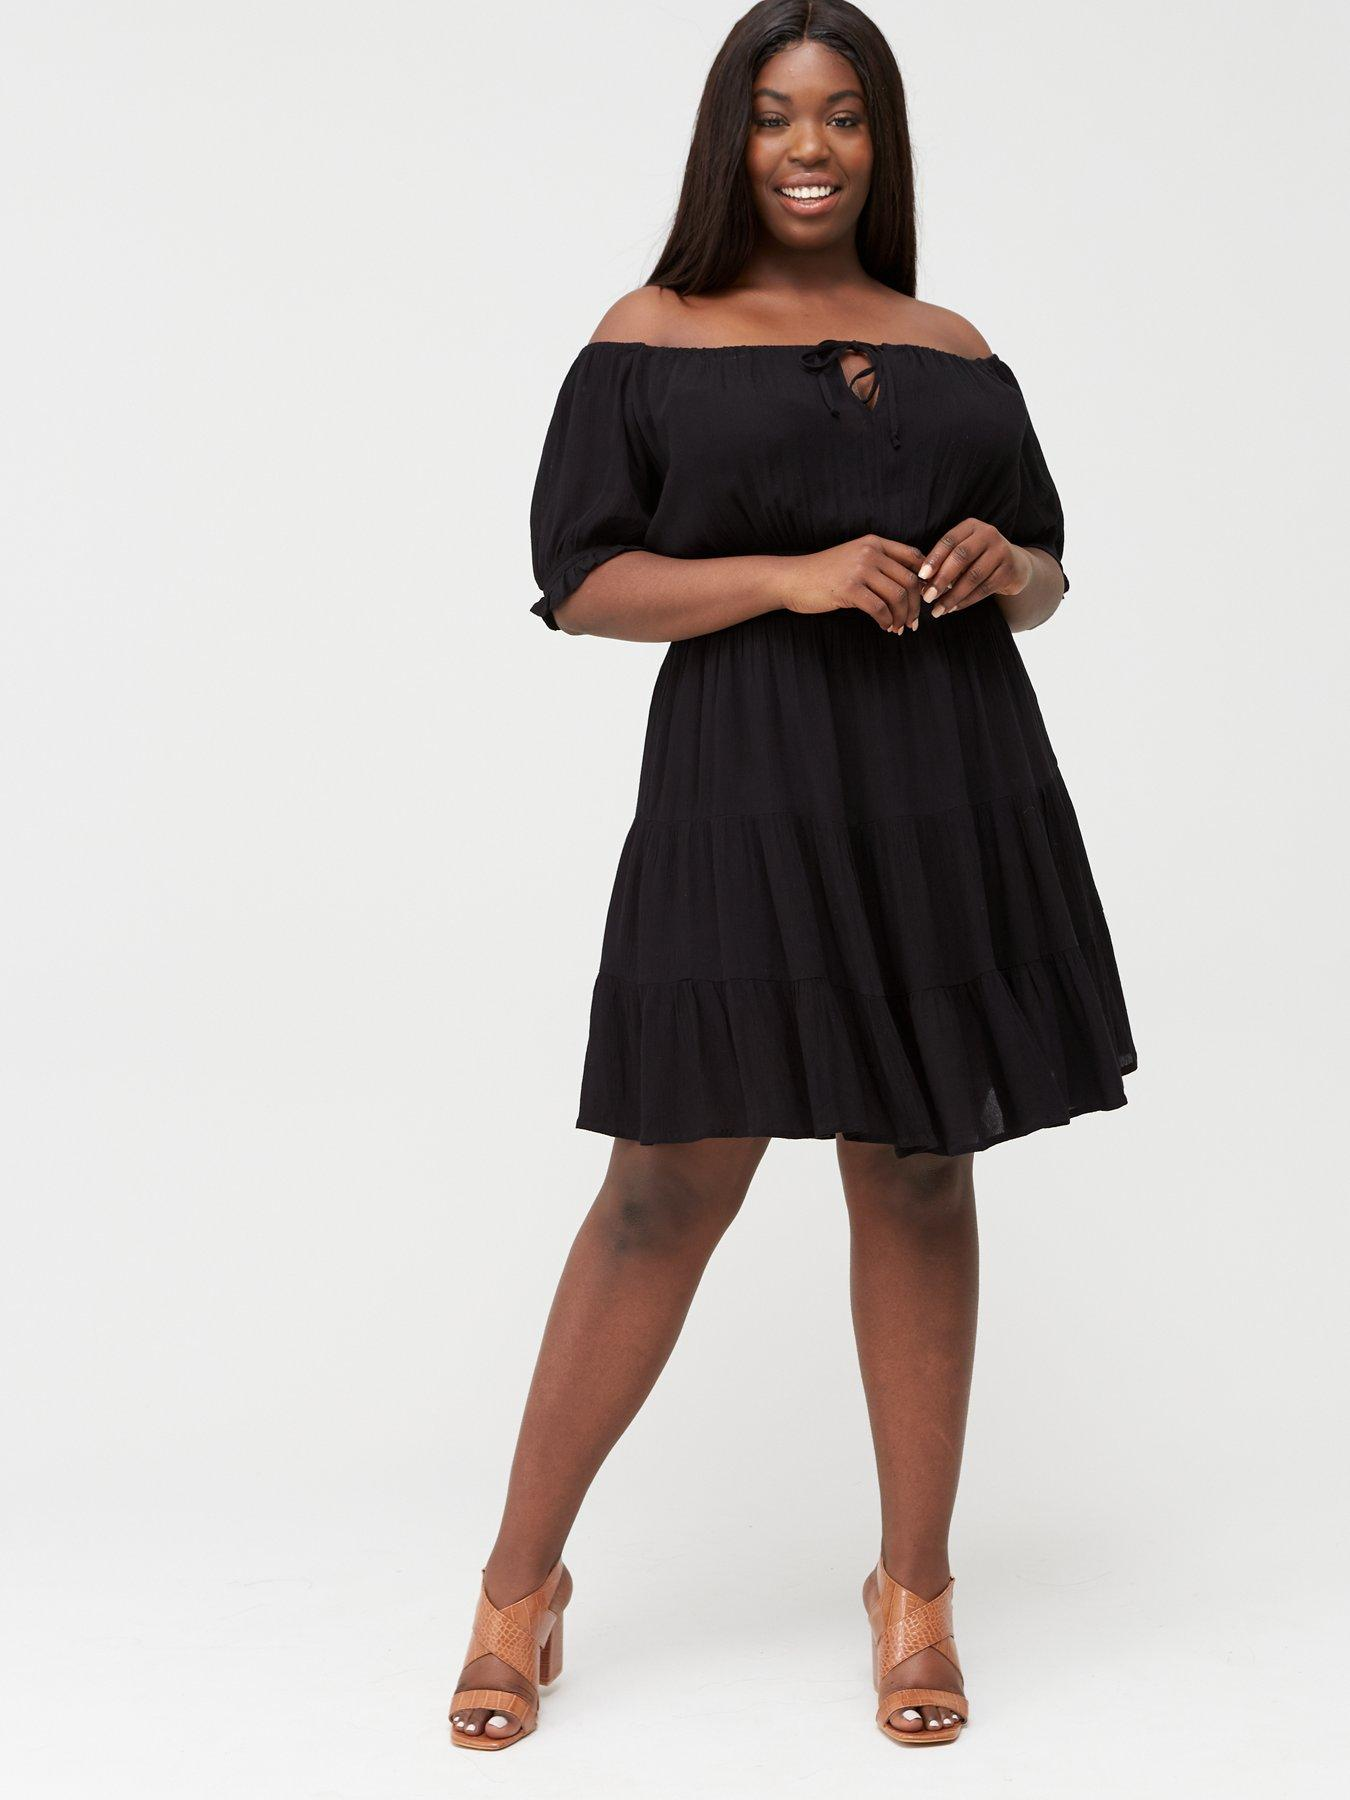 3 Pairs Ladies Black//White Crinkle Briefs 4 Sizes.